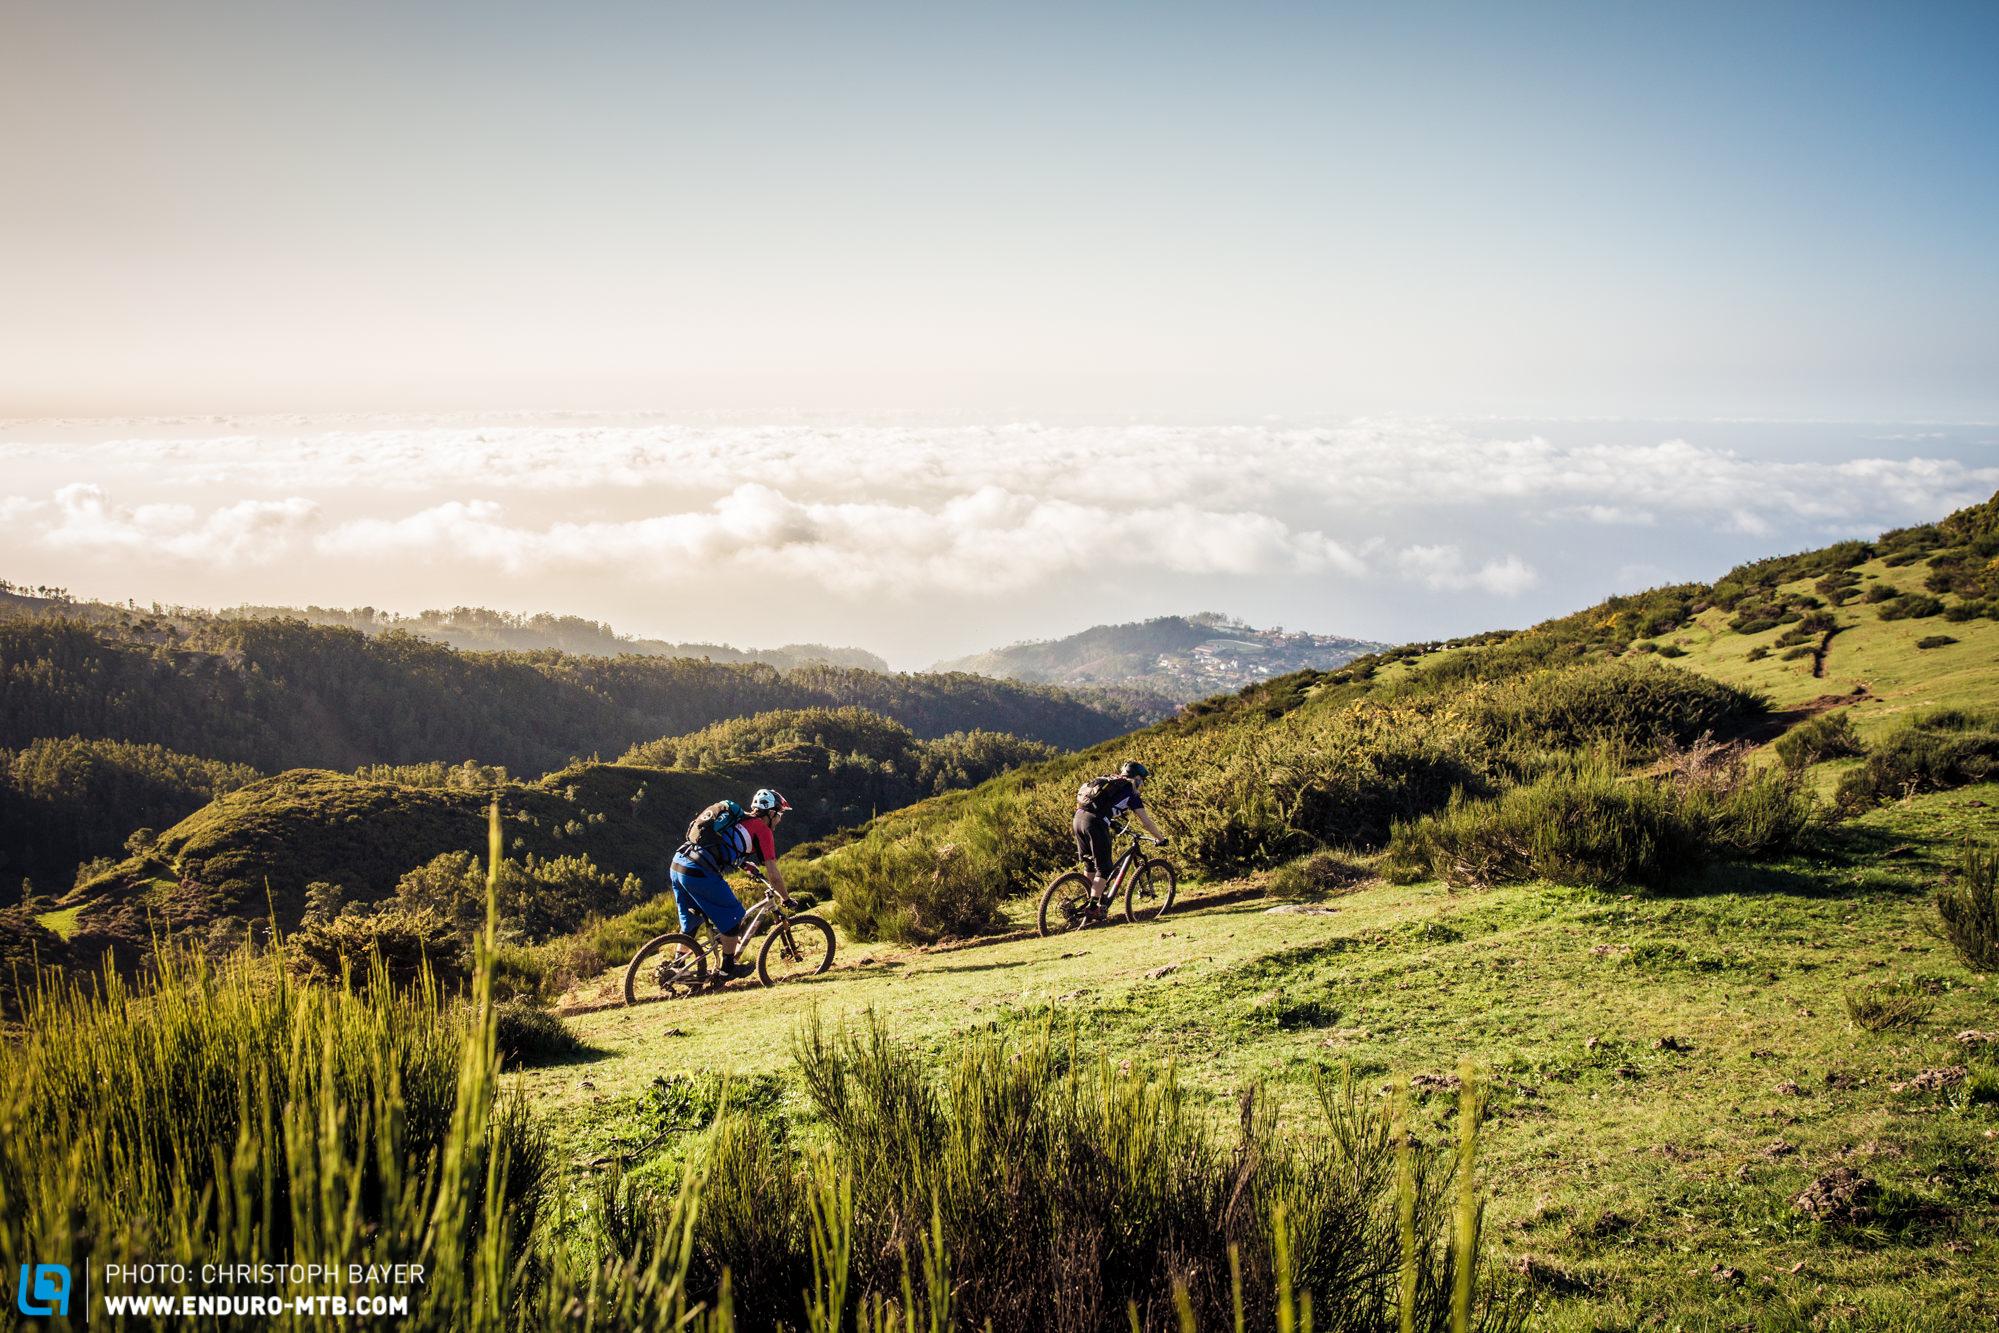 madeira-bike-holidays-travel-cb-46.jpg